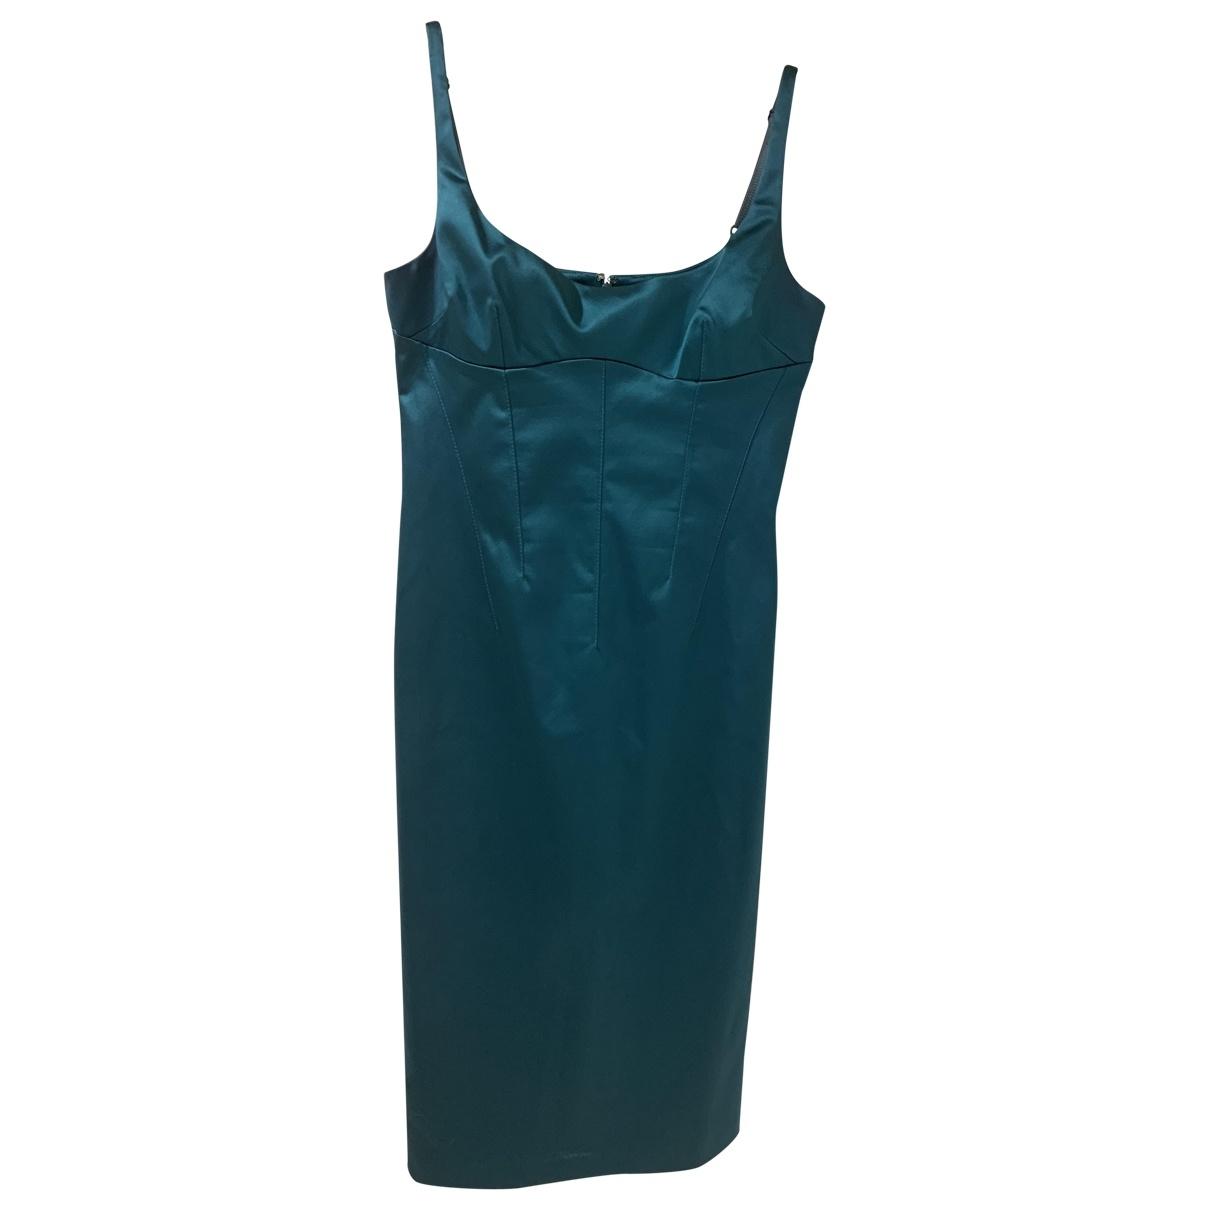 D&g - Robe   pour femme - turquoise